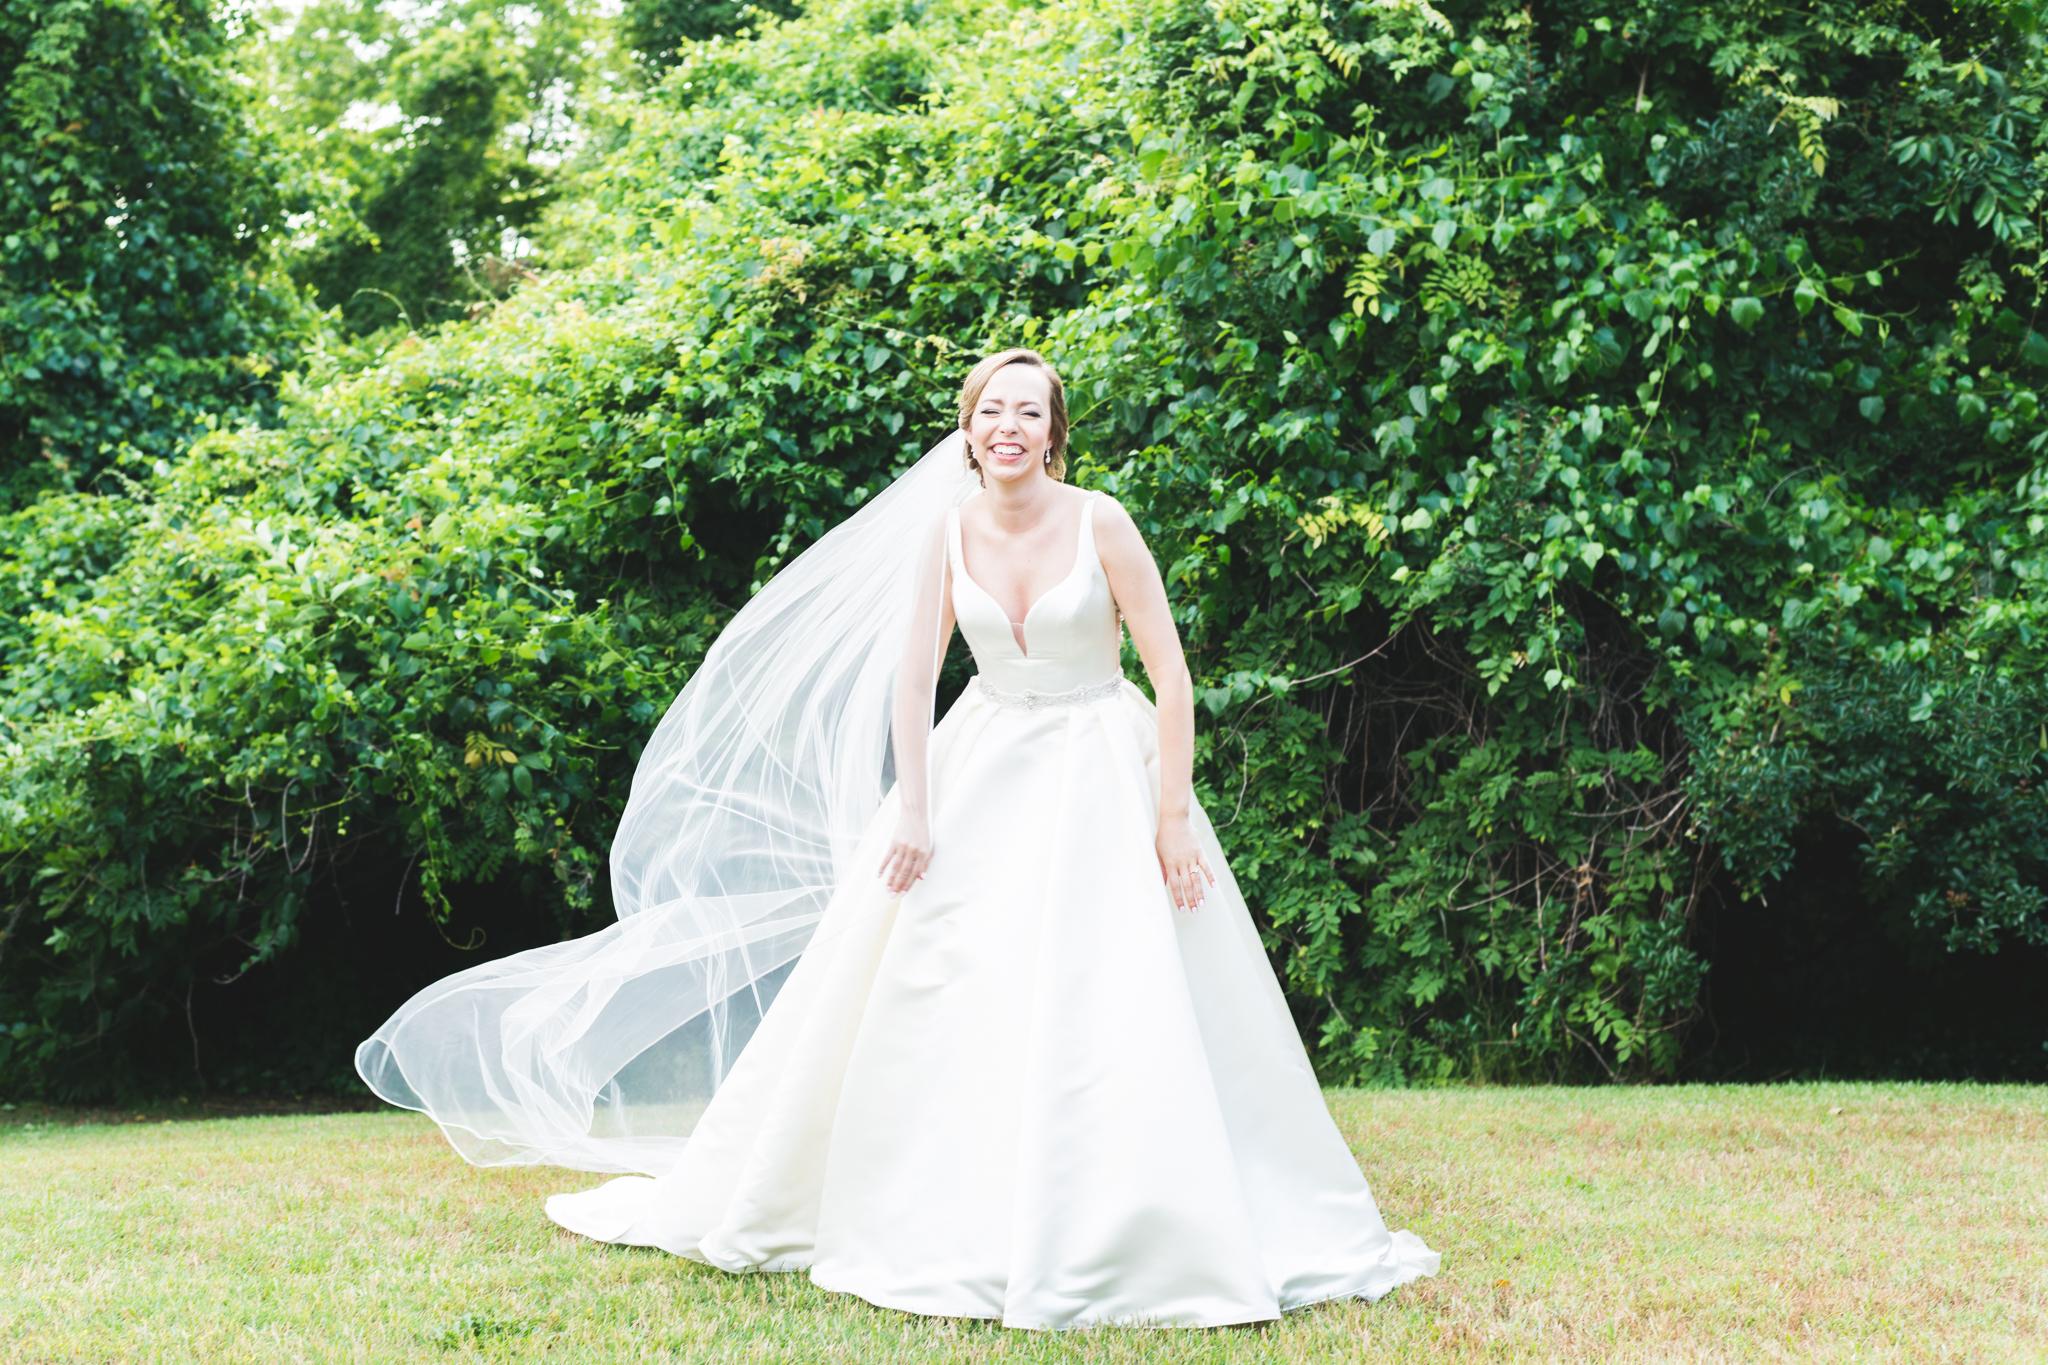 Bridals_MadisonReke_Blog-11.jpg